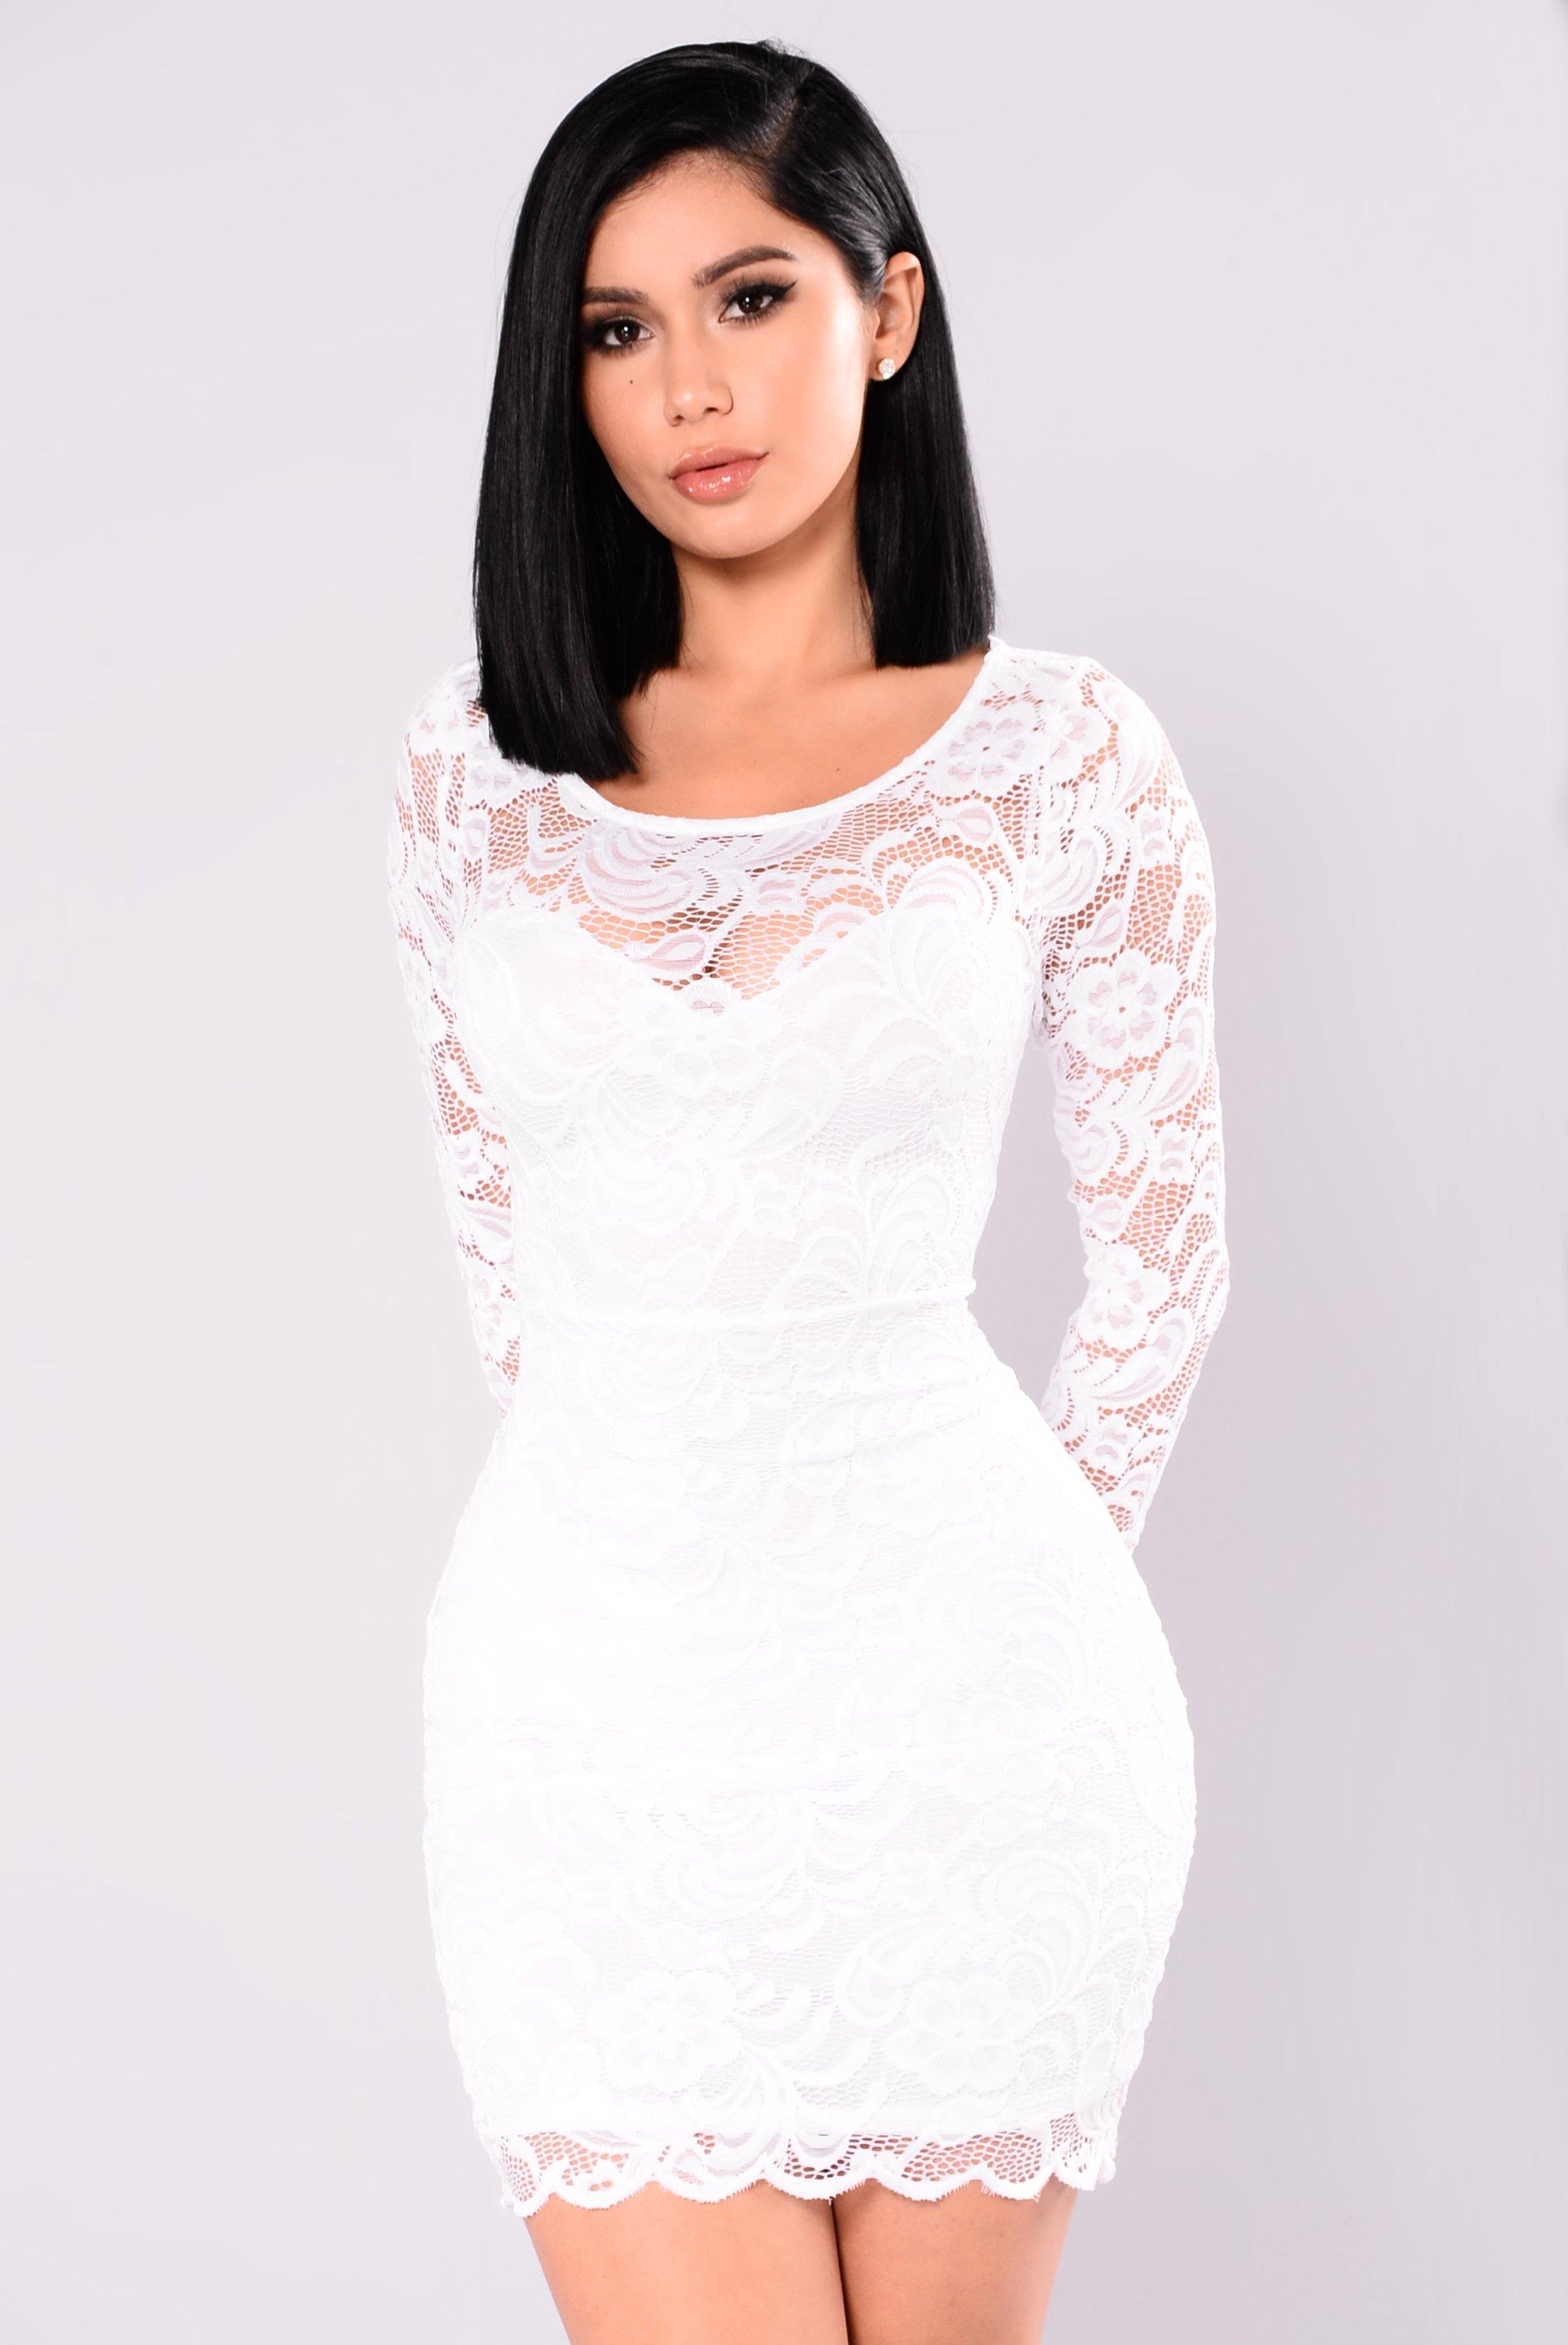 0c2706217d5 US  7.5 - White Lace Mini Dress 27233-2 - www.global-lover.com